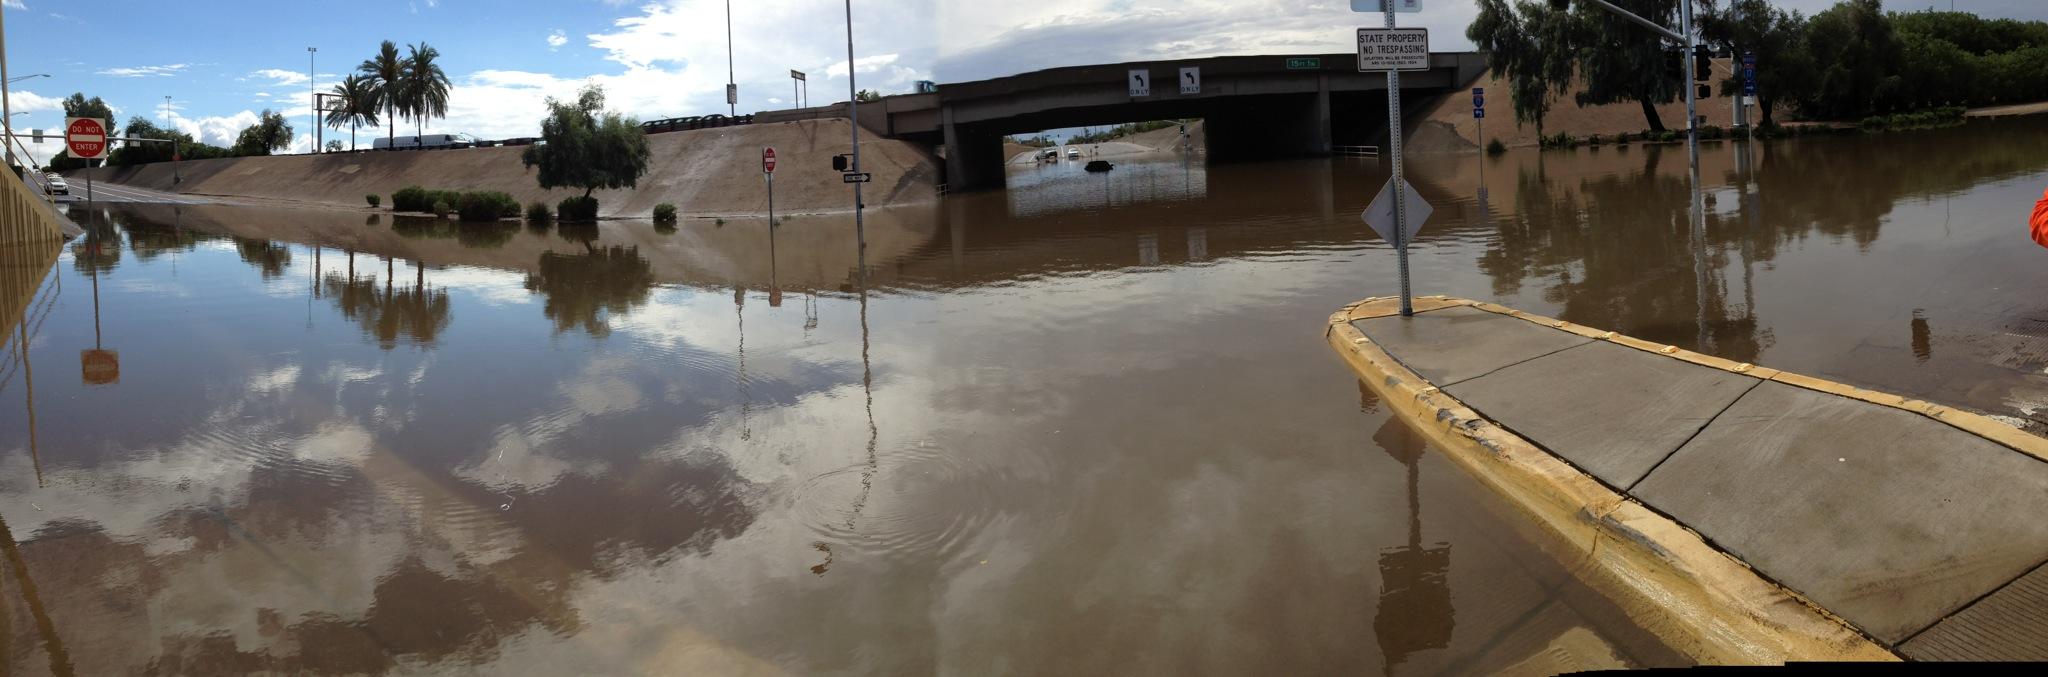 Flooded I-17 Interchange